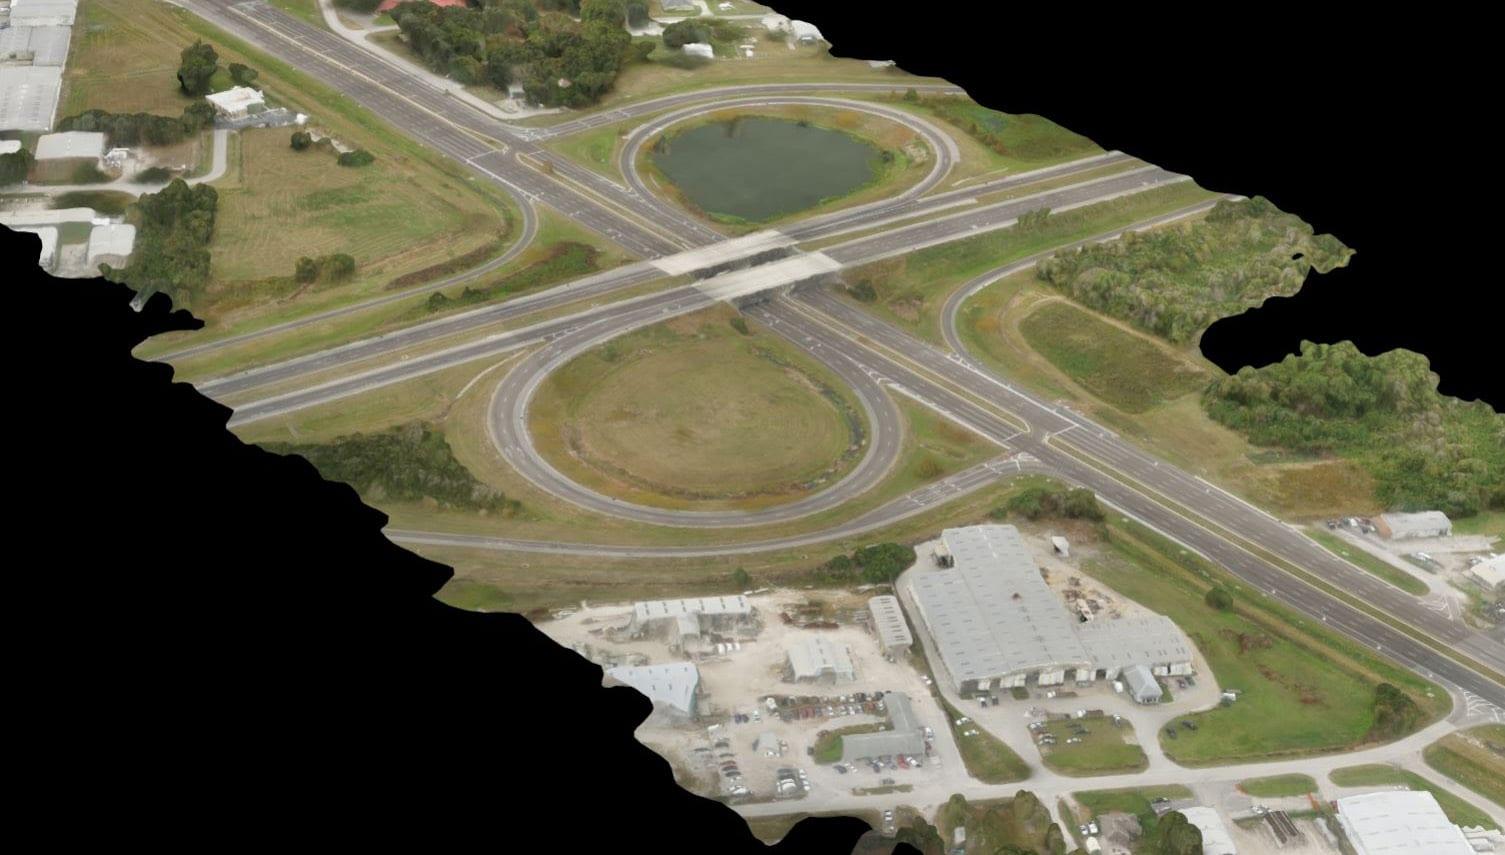 UAS Aerial LiDAR Scan of the Fort Frasier Trail Extension, Polk County, FL